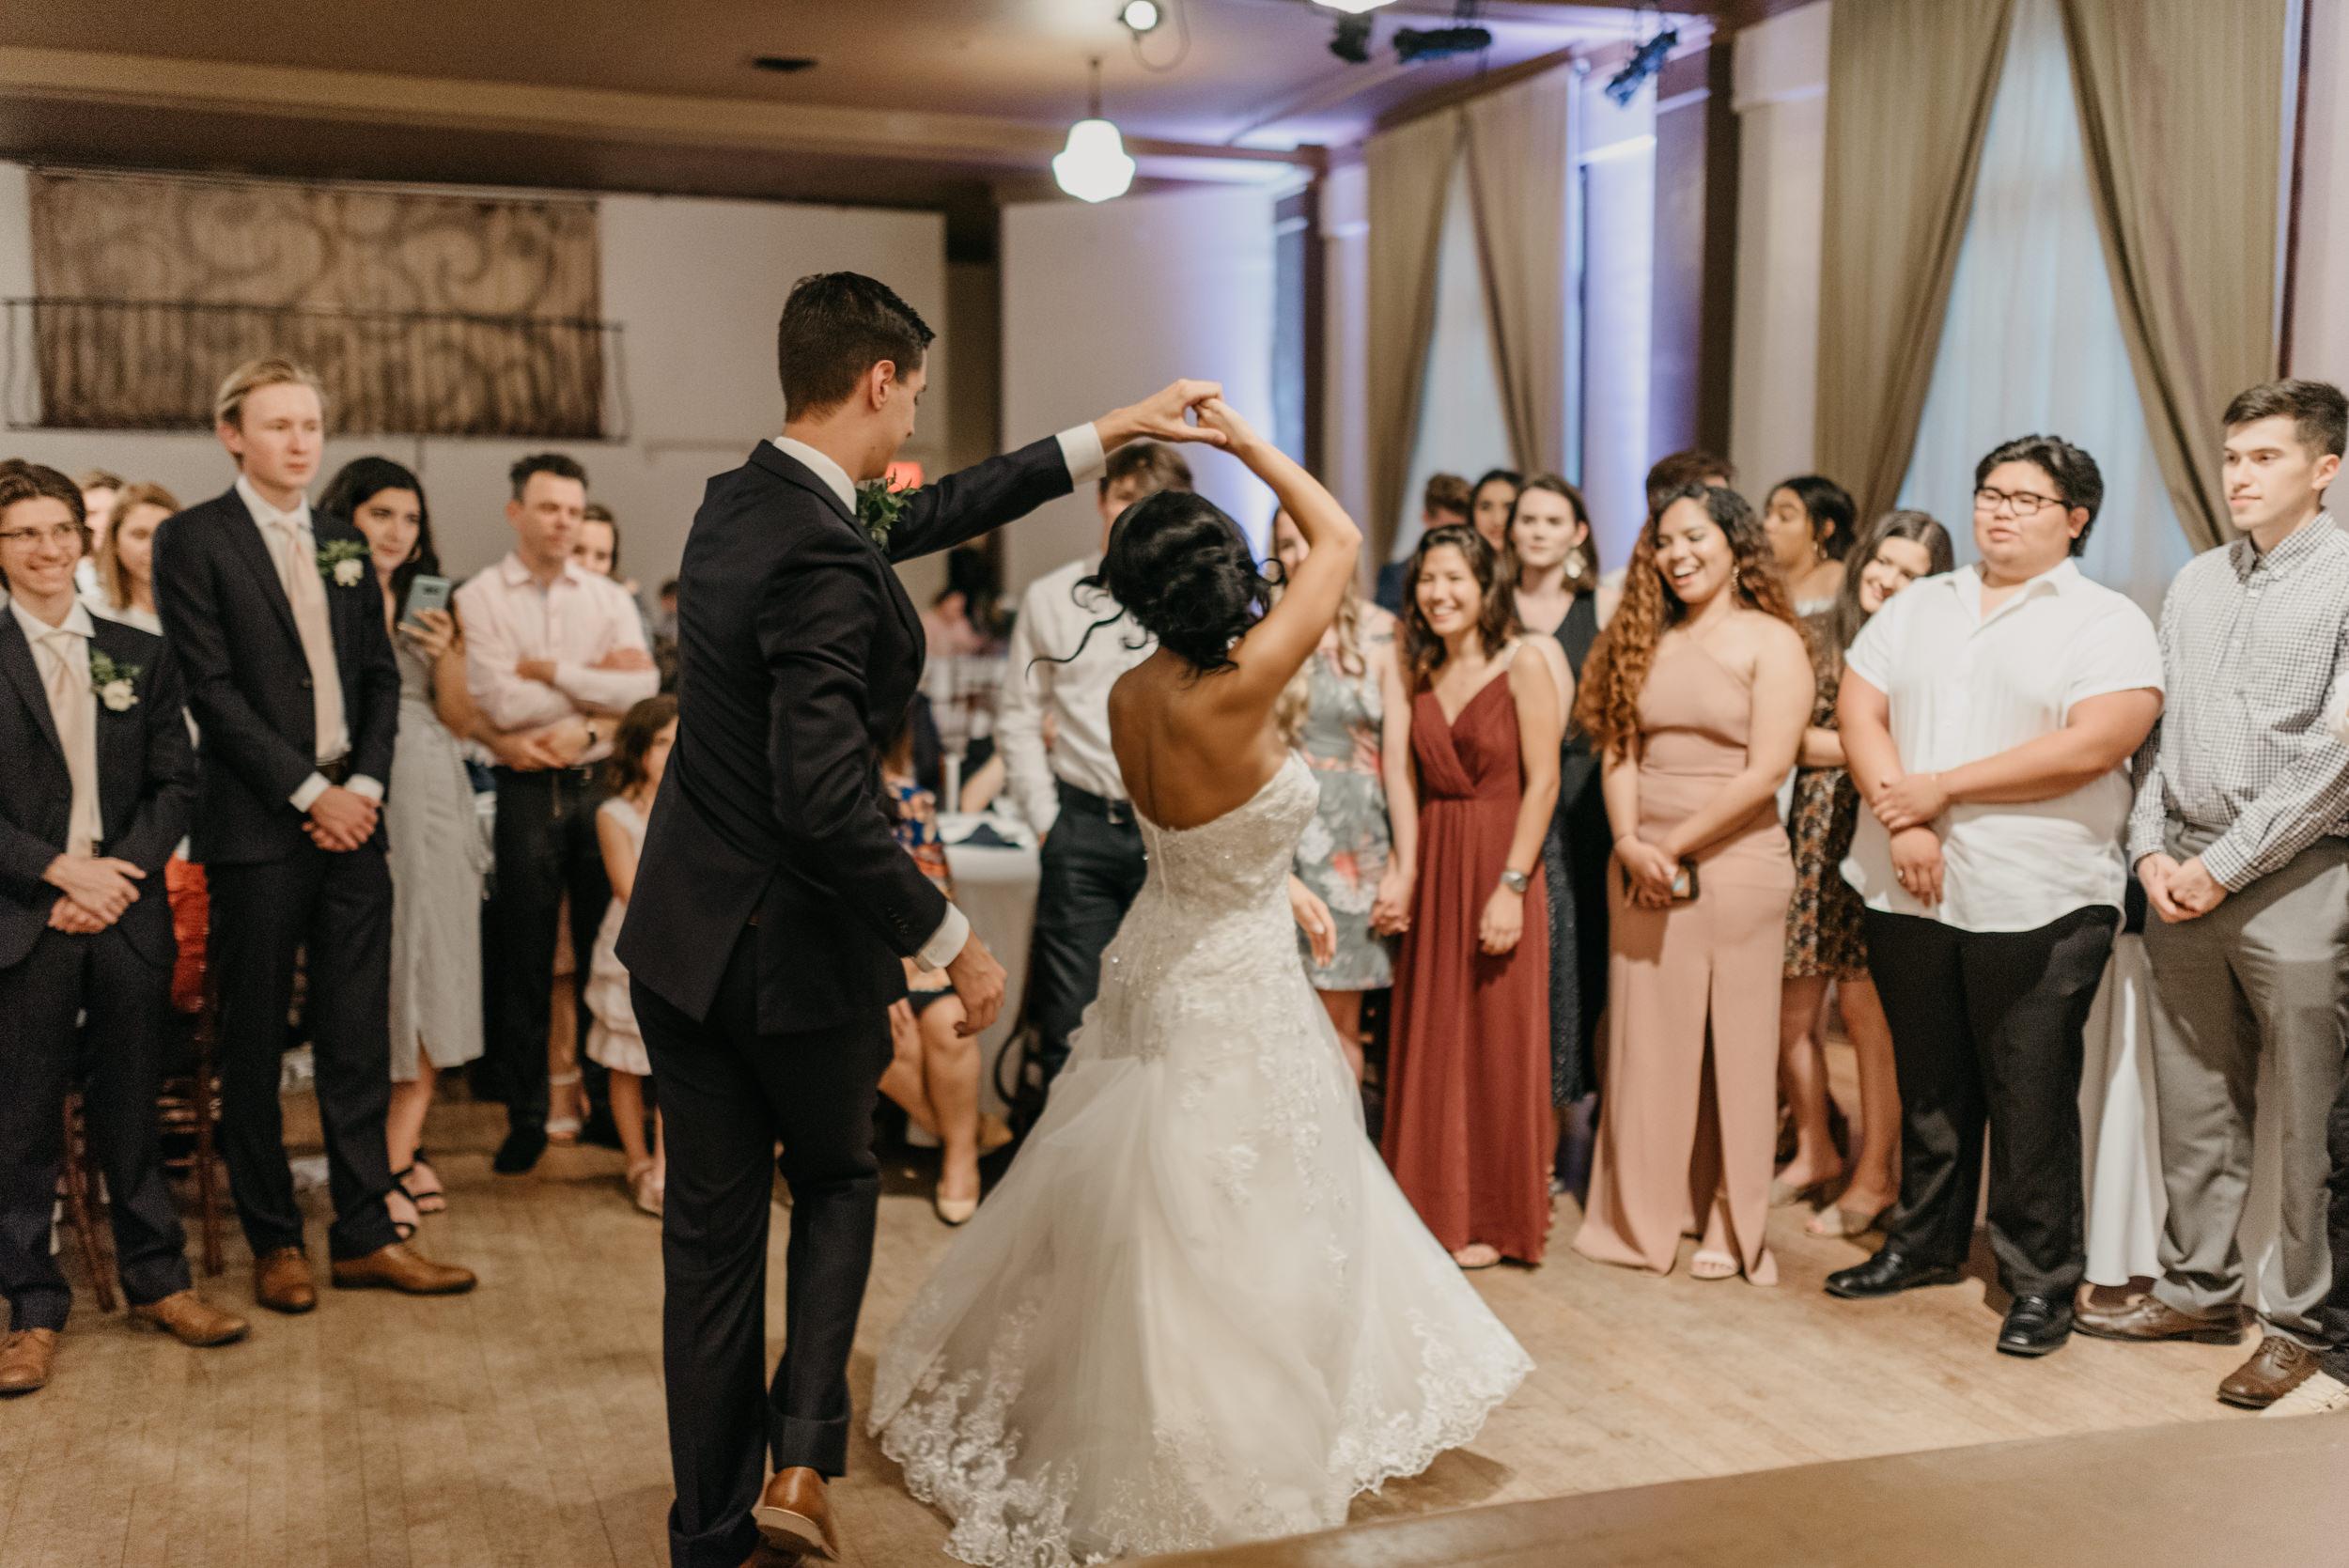 121-reception-west-end-ballroom-portland-wedding-photographer-8707.jpg